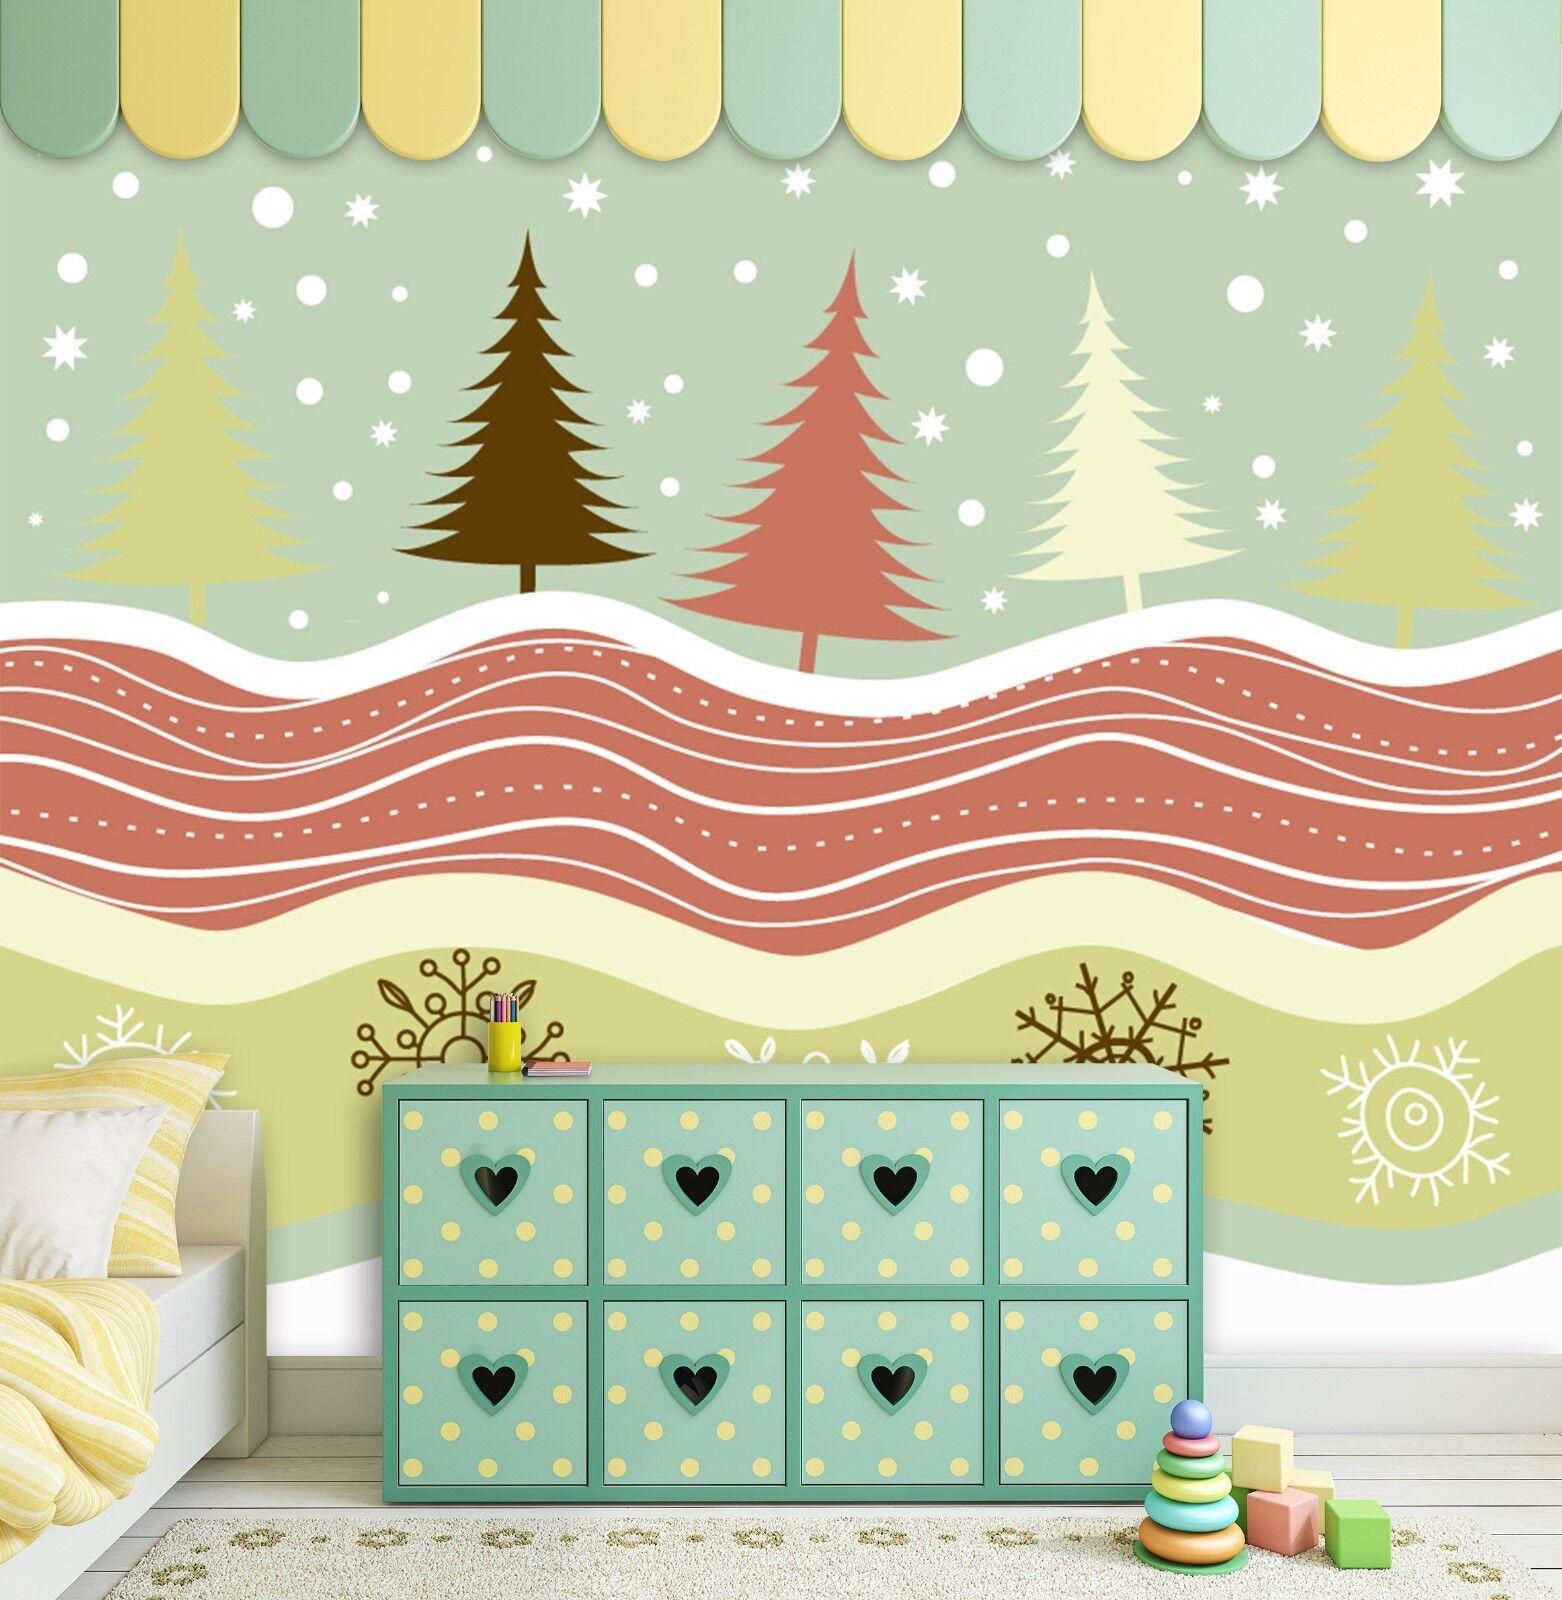 3D Sky Grove Pattern 538 Wallpaper Murals Wall Print Wallpaper Mural AJ WALL AU